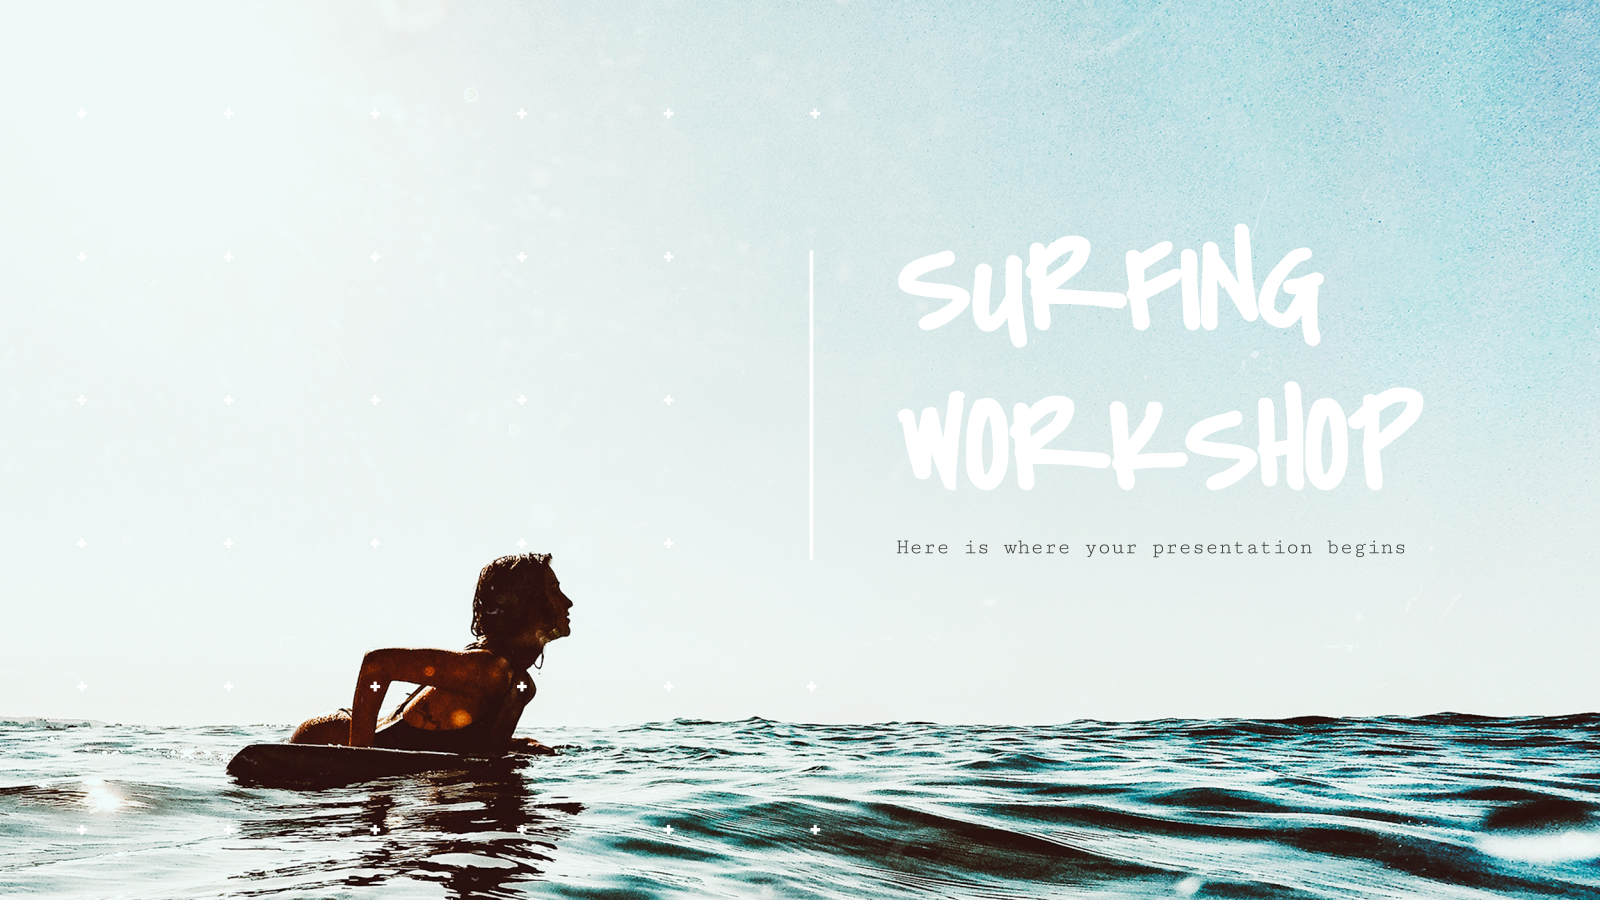 Plantilla de presentación Taller de surf